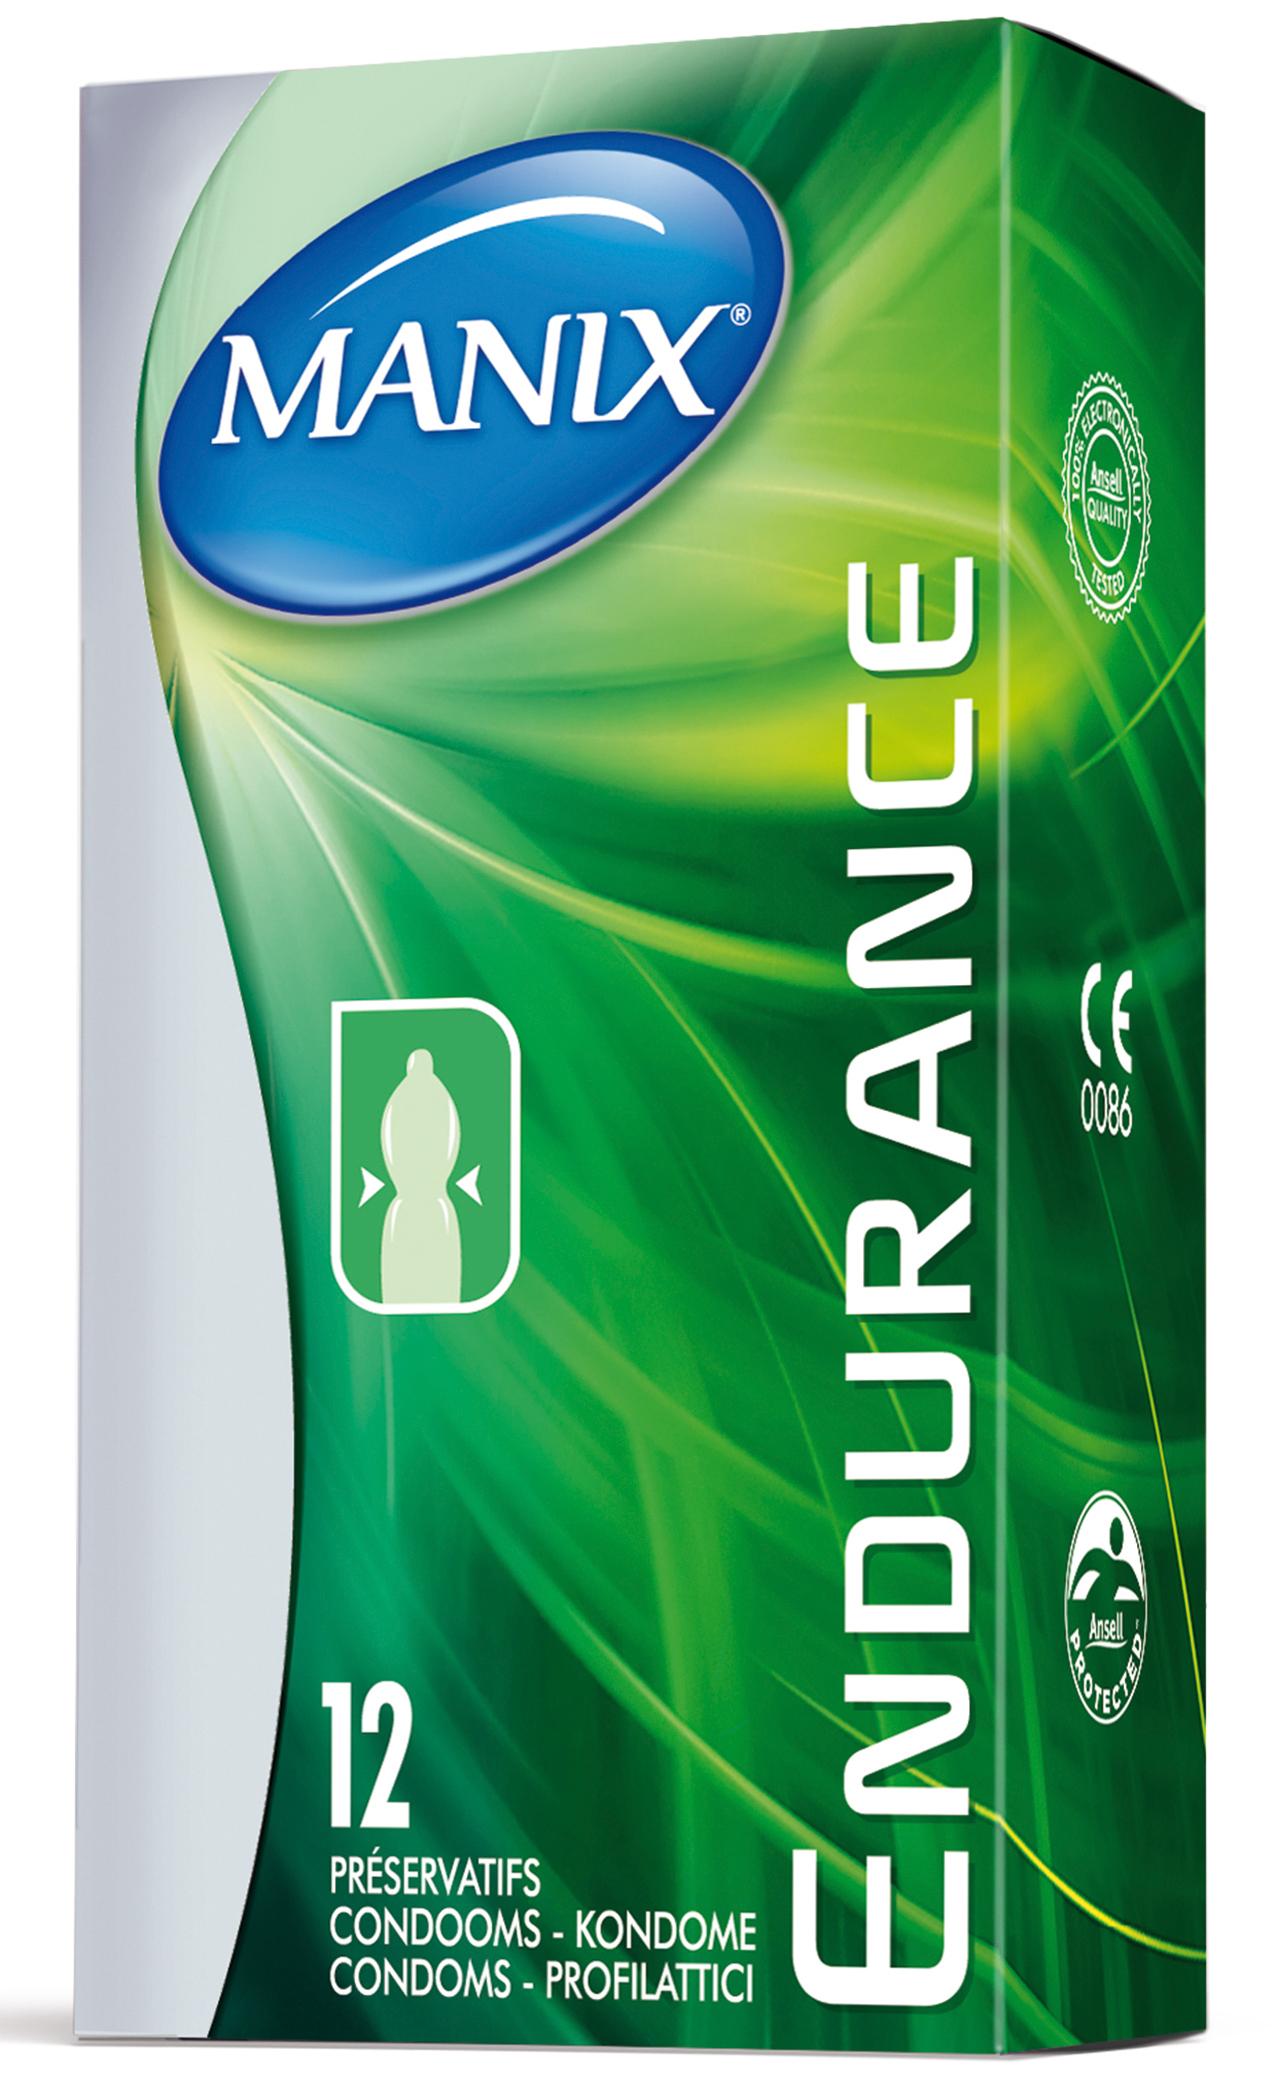 manix endurance manix kondome kondome. Black Bedroom Furniture Sets. Home Design Ideas